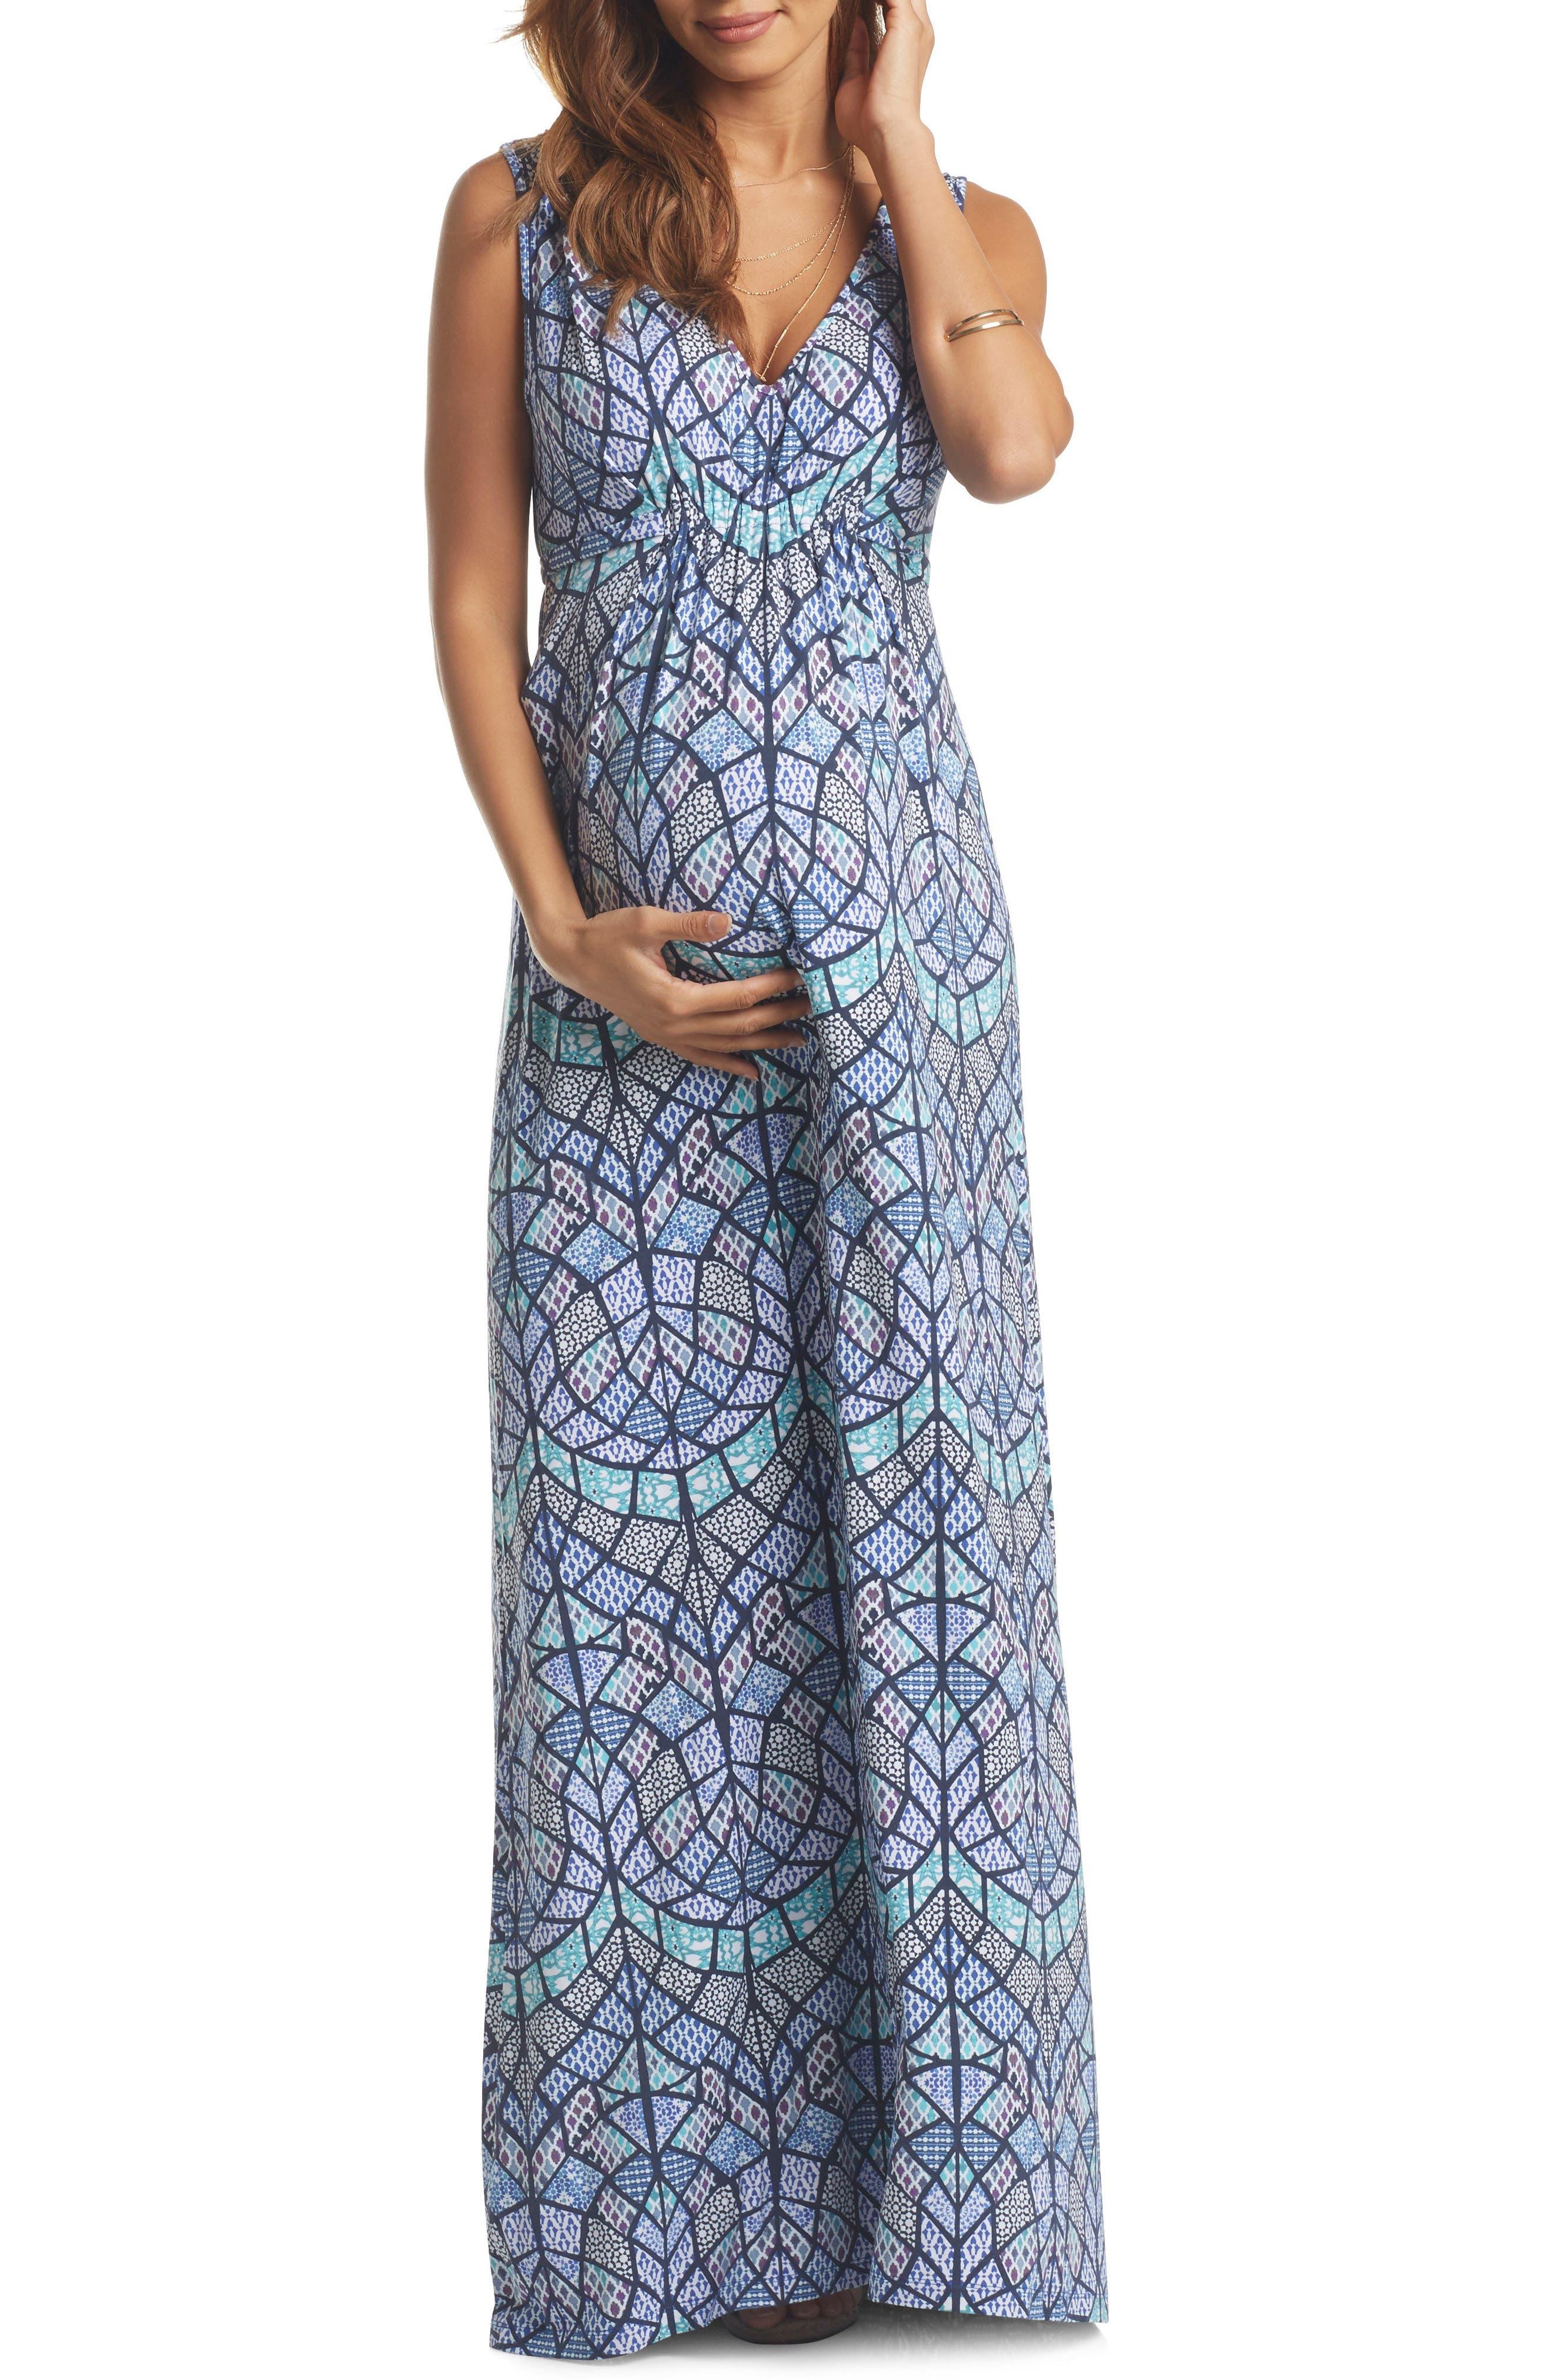 'Grecia' Print Jersey Maternity Maxi Dress,                         Main,                         color, Tile Mosaic